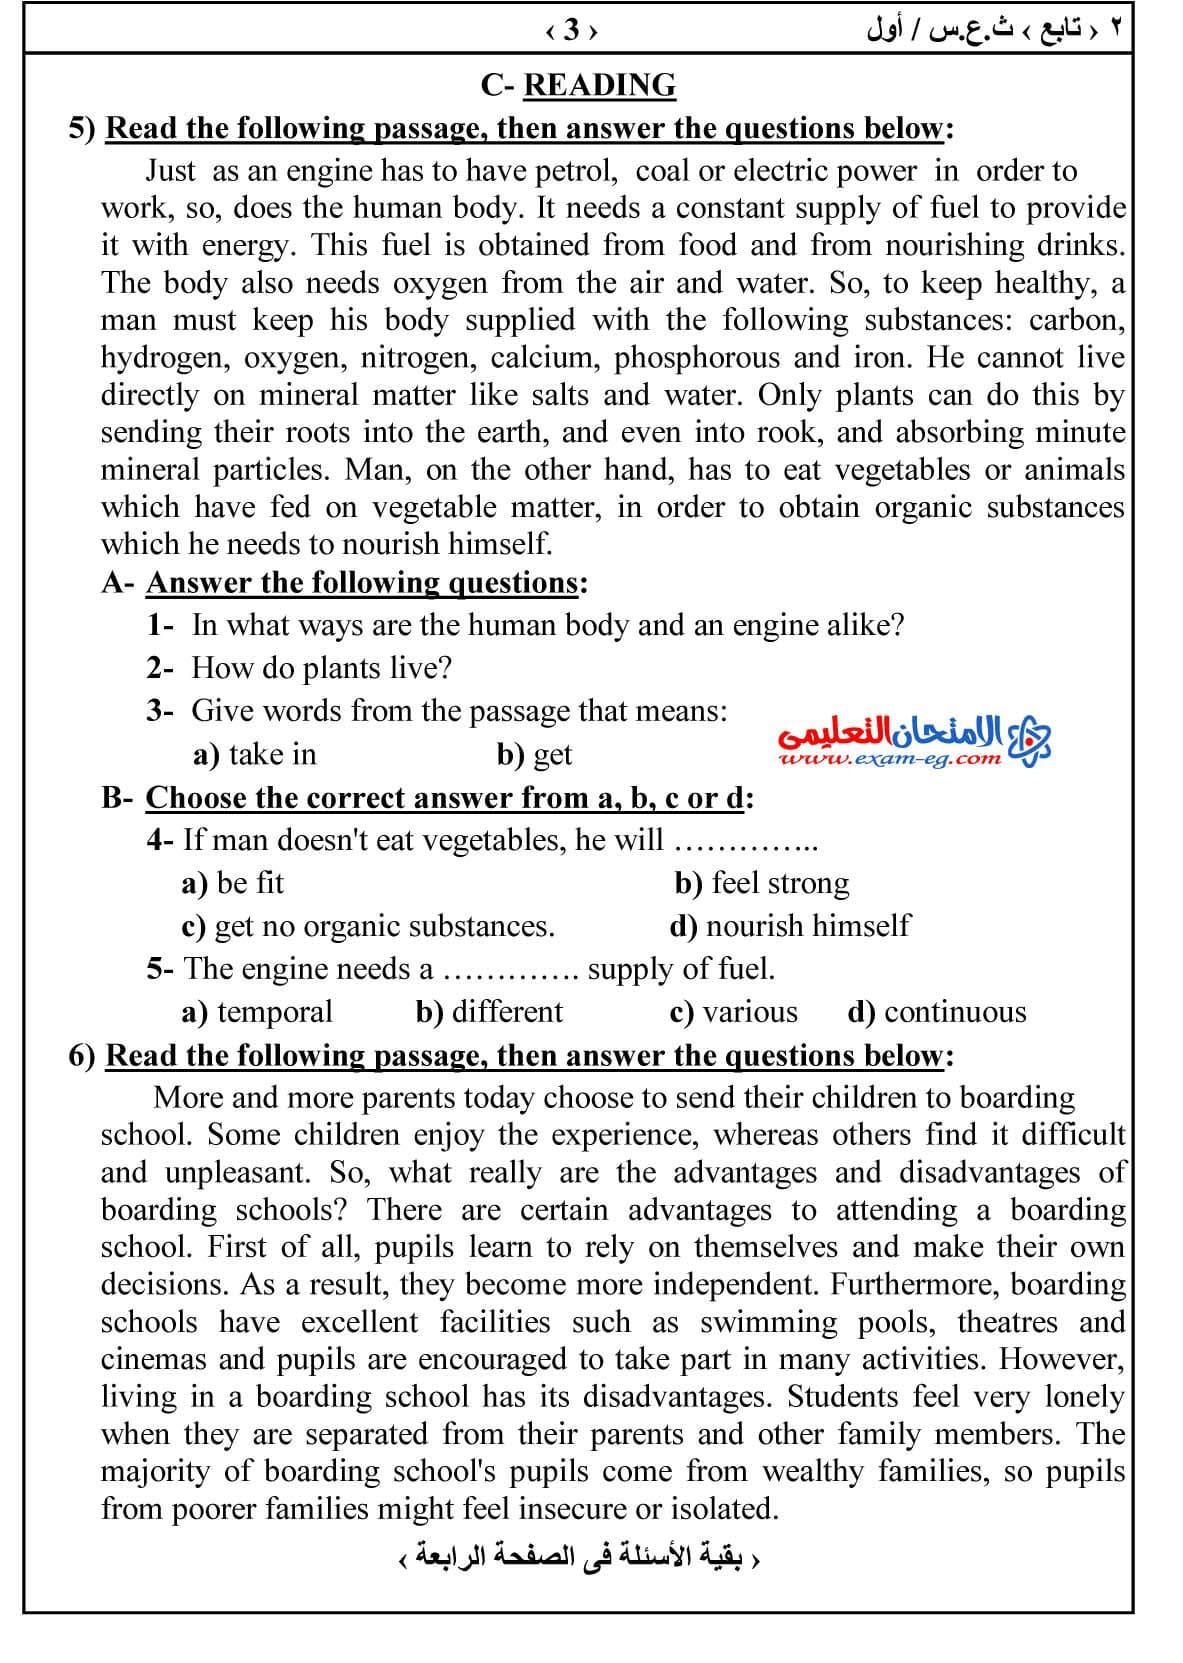 exam-eg.com_1429231071973.jpg